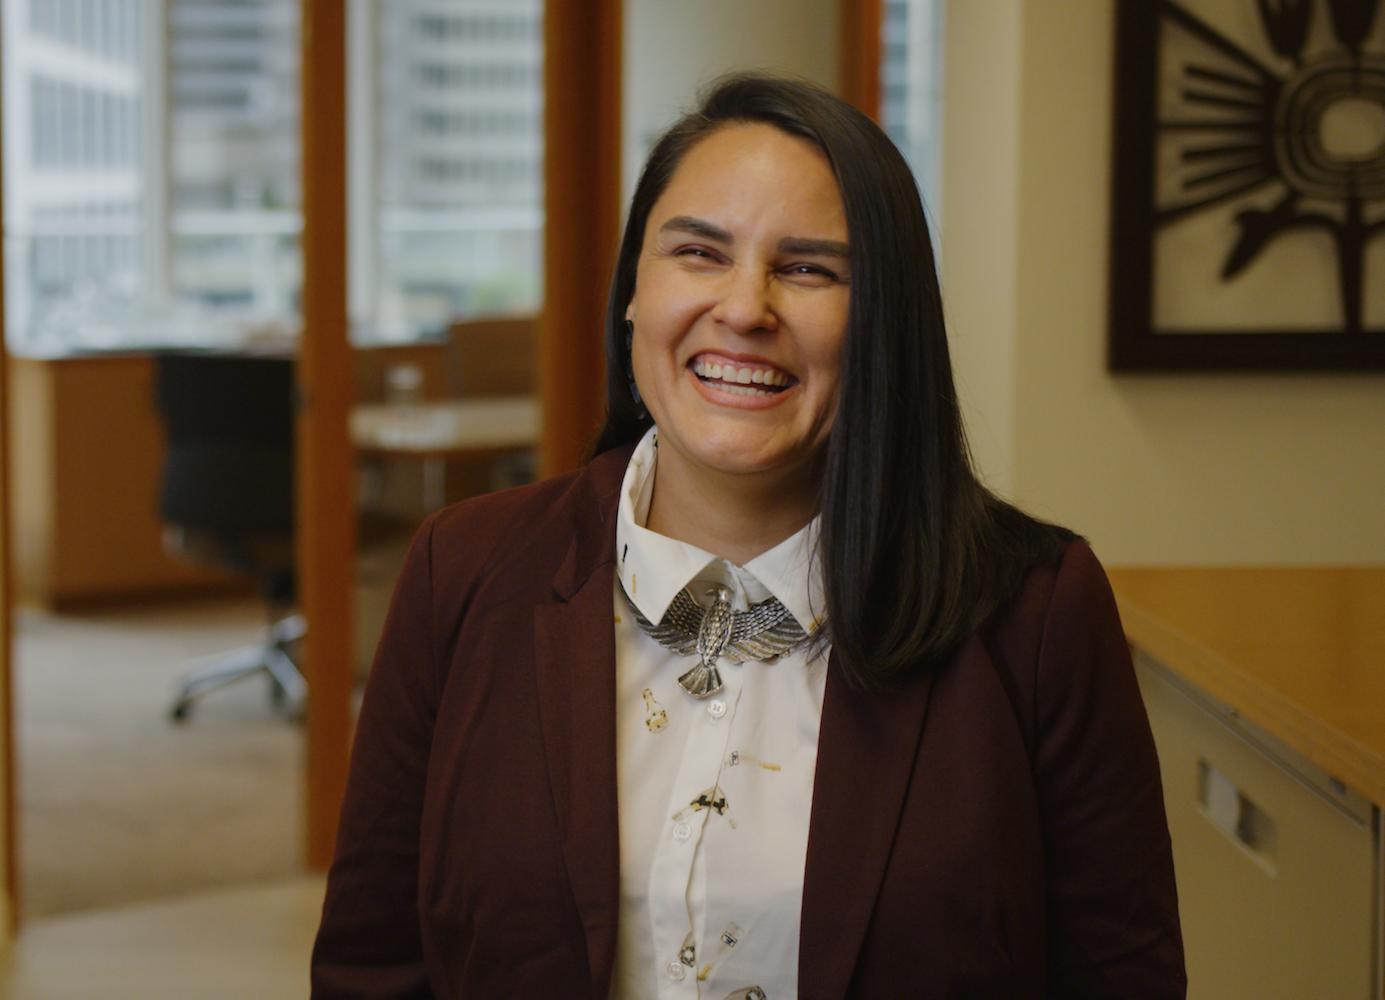 Indigenous Business Award of Distinction: Shifting the Narrative